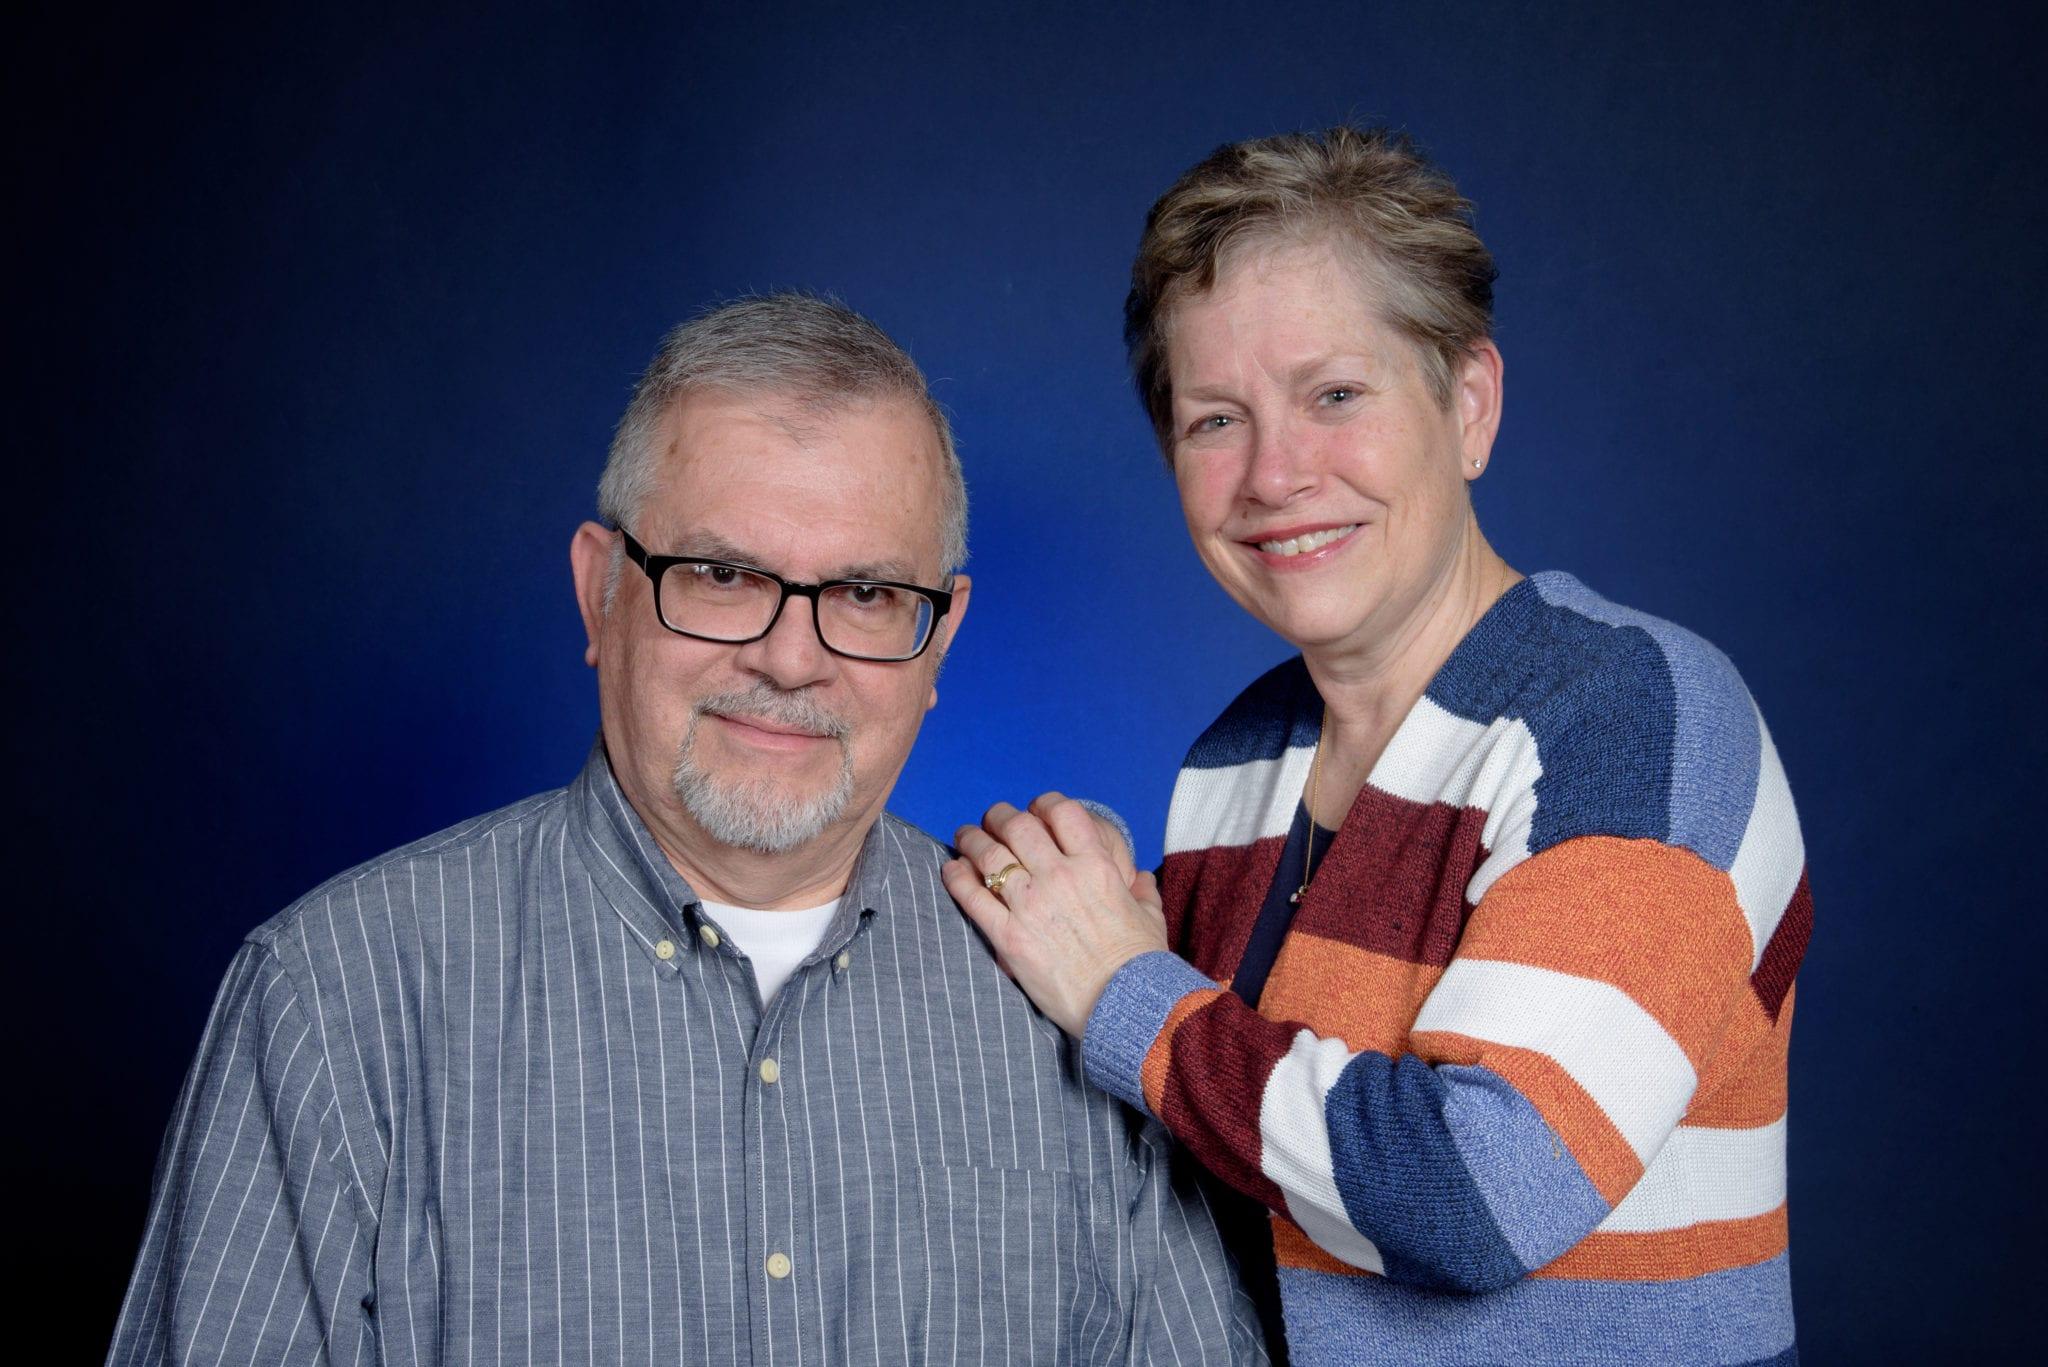 Tim and Jeanne Davies